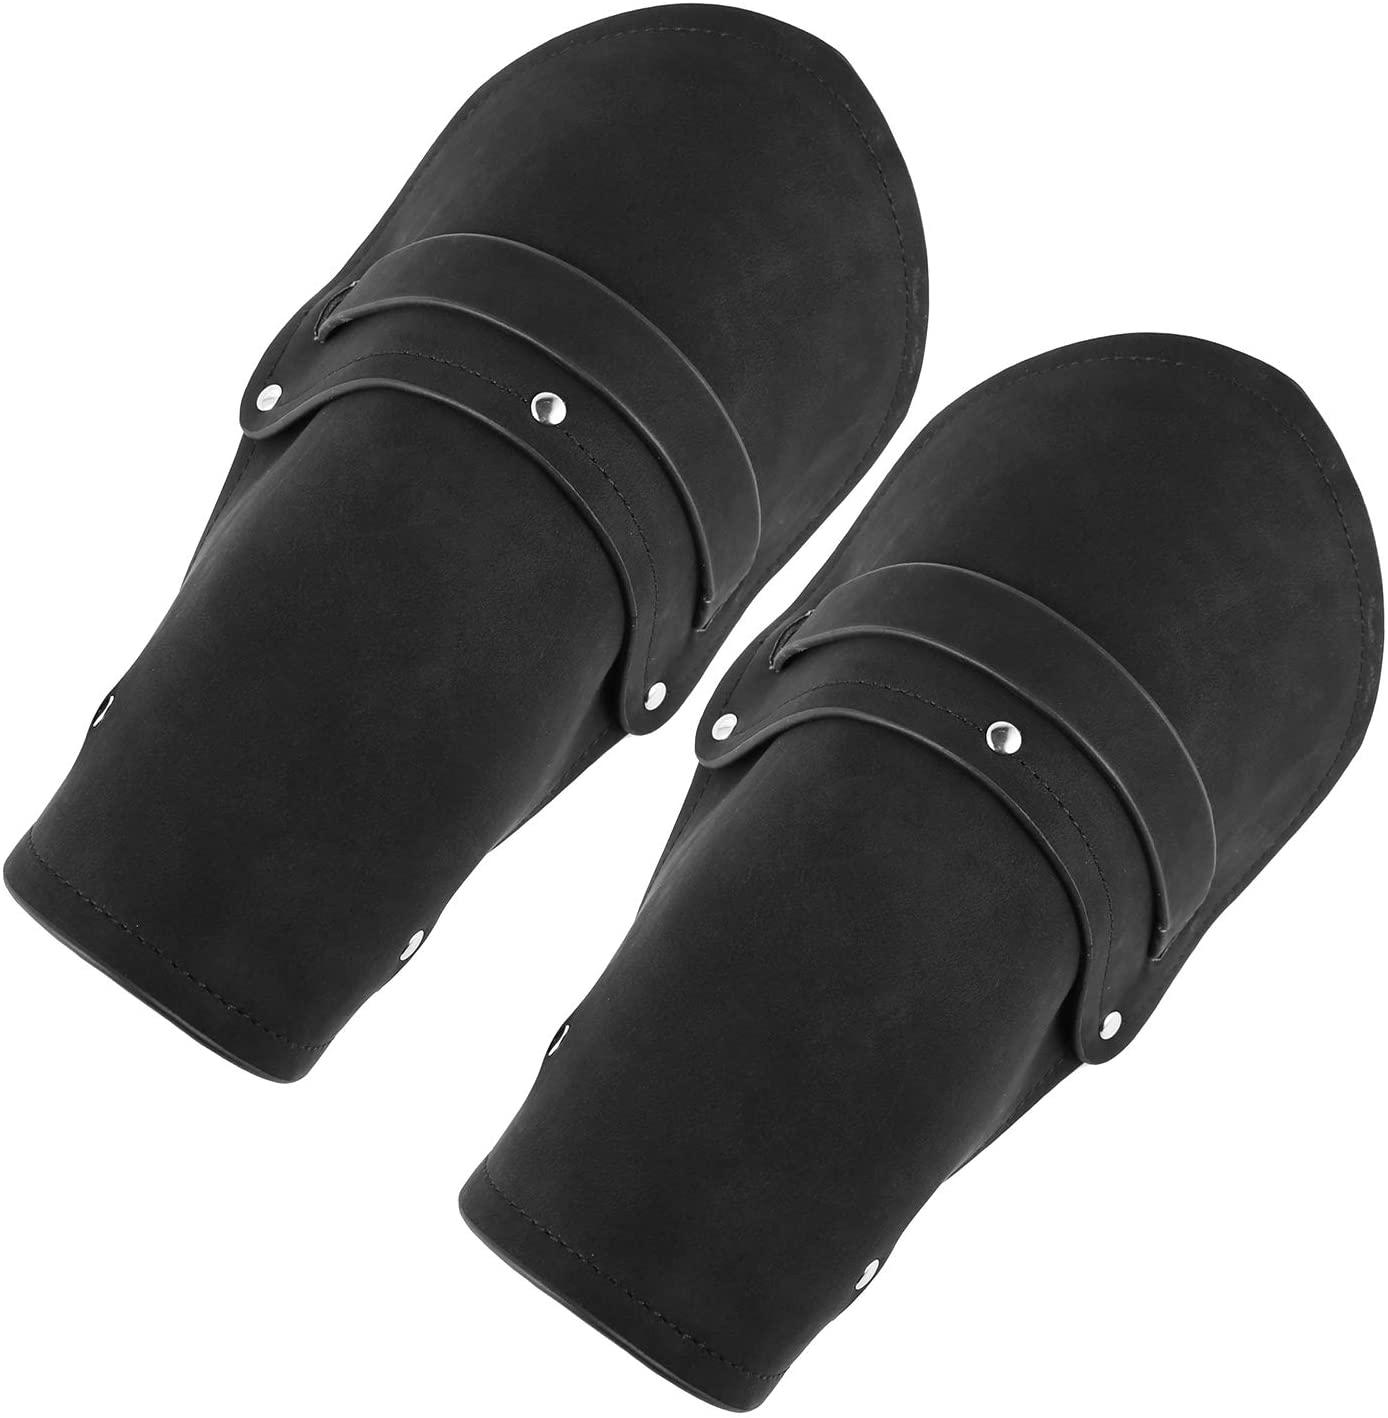 HZMAN Leather Gauntlet Wristband Medieval Bracers Wrist Band Wide Bracer Arm Armor Cuff, 2 Pcs